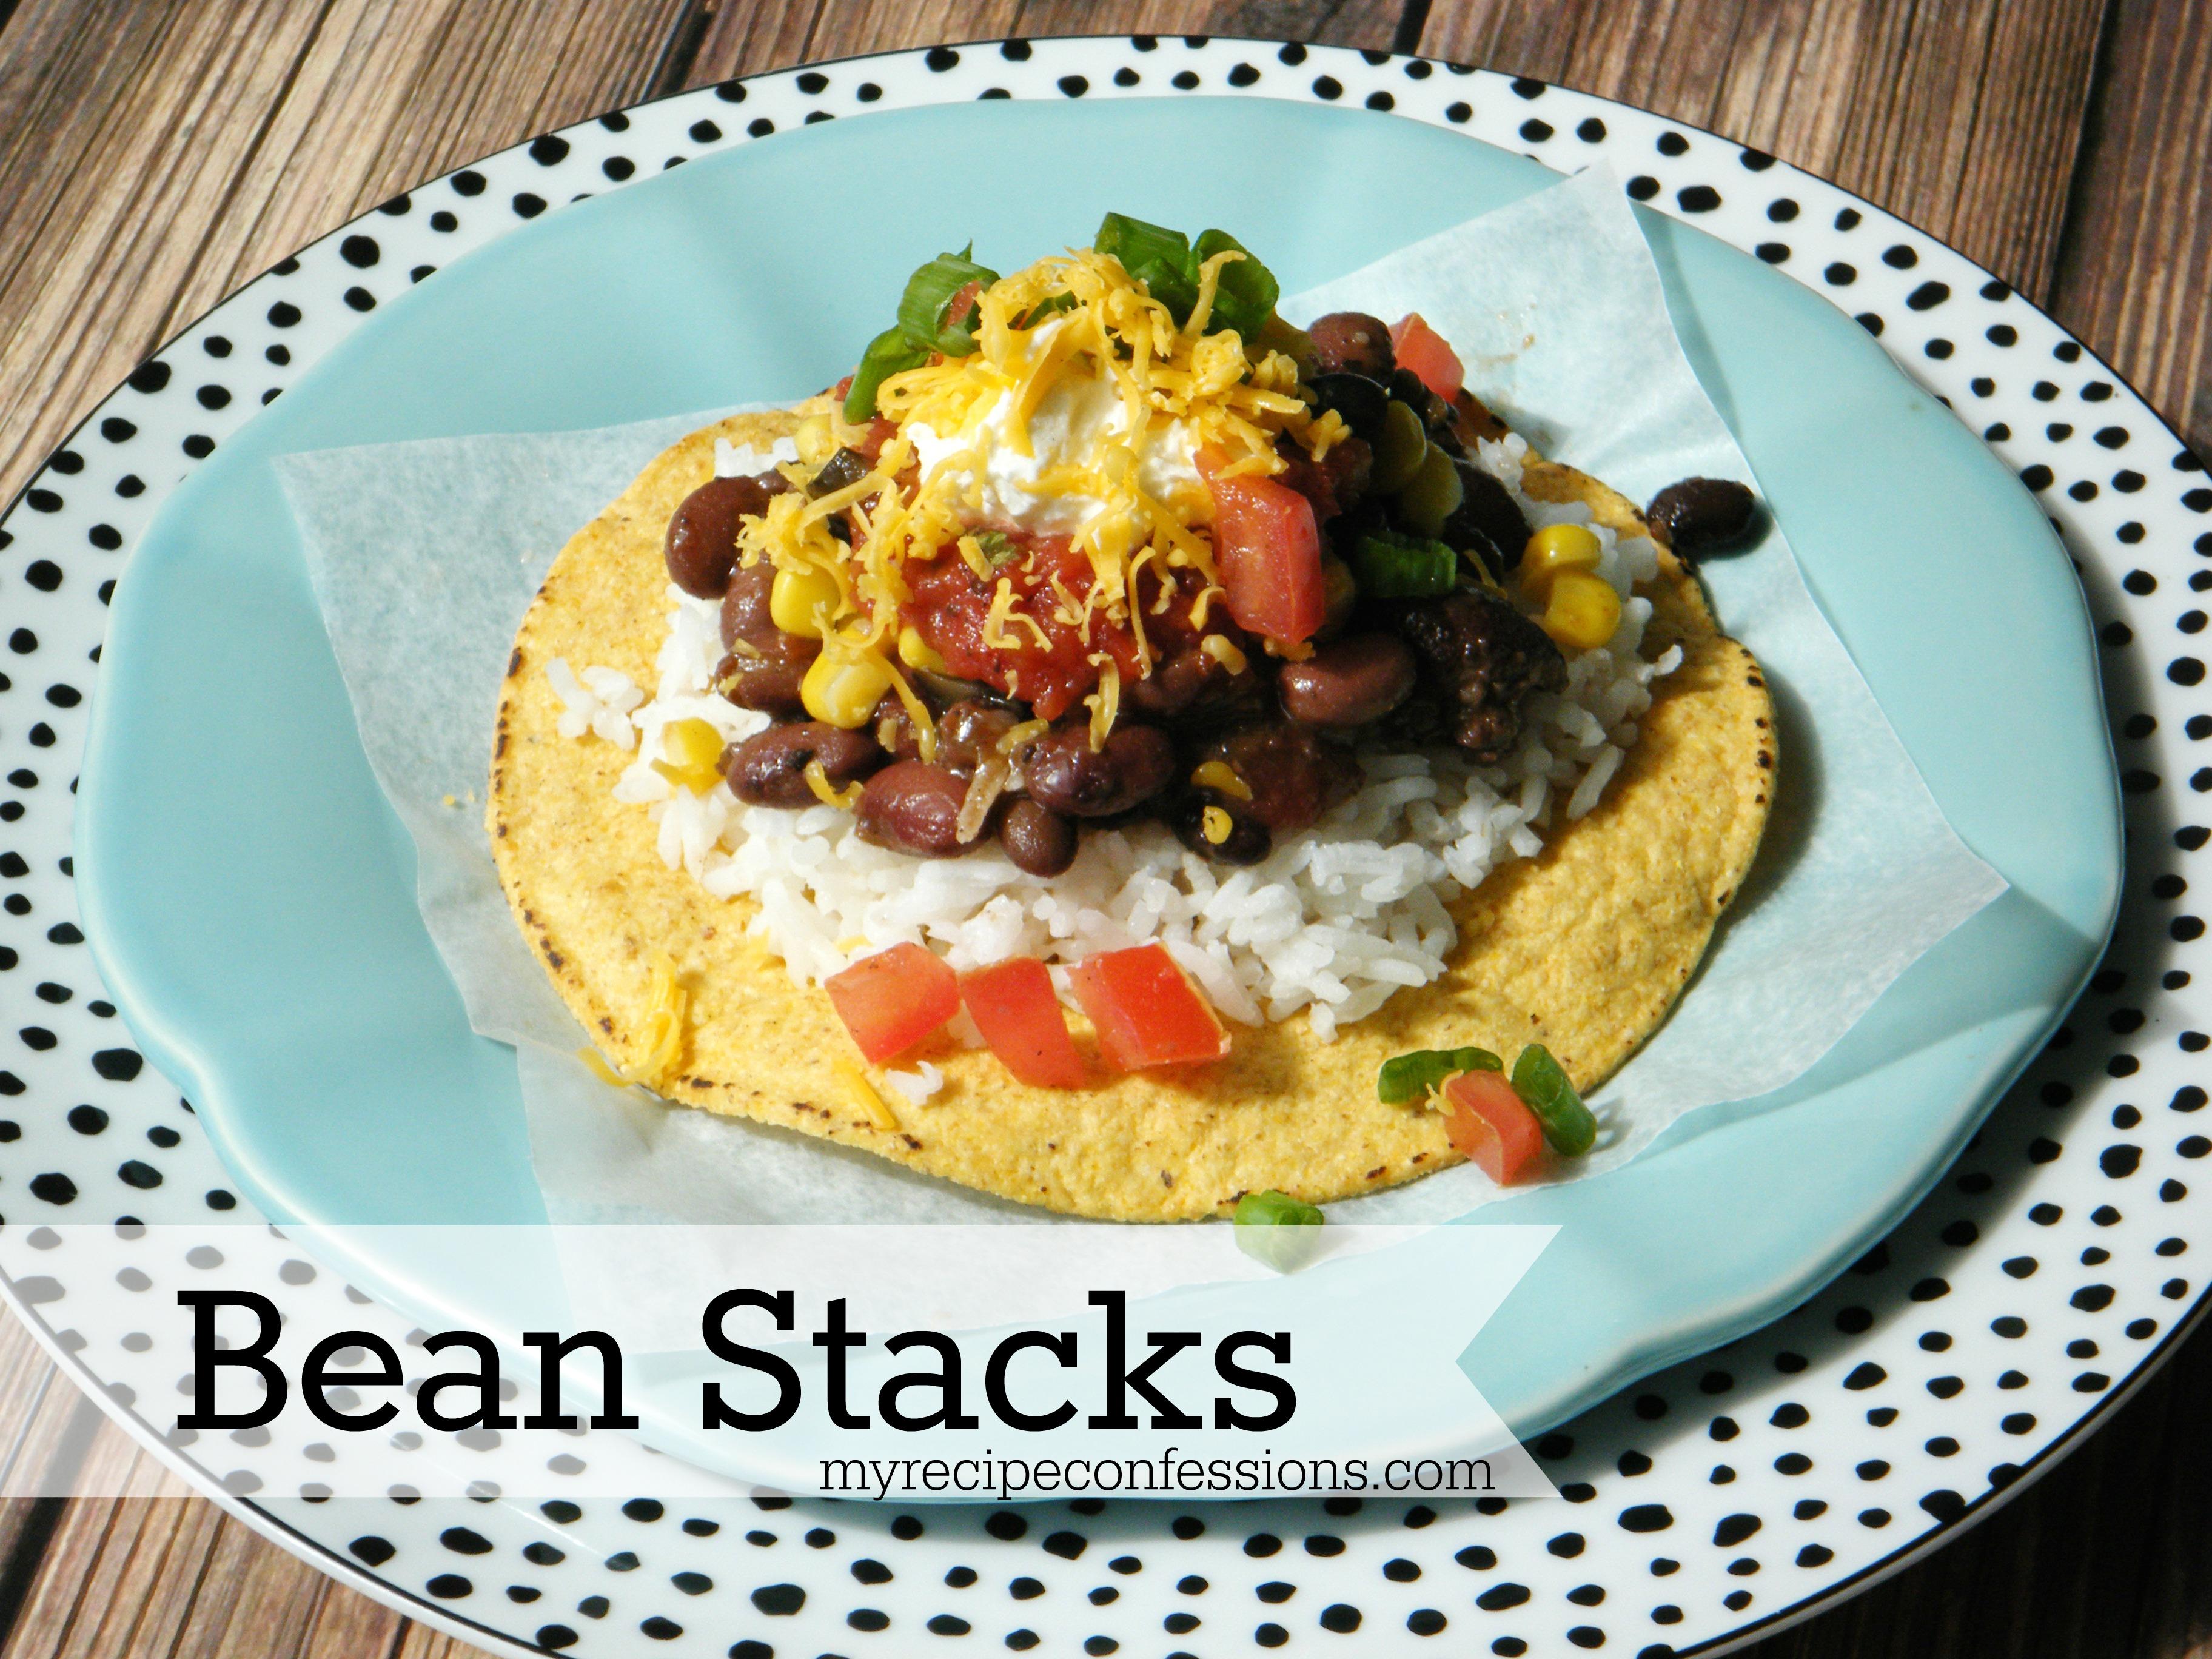 Bean Stacks